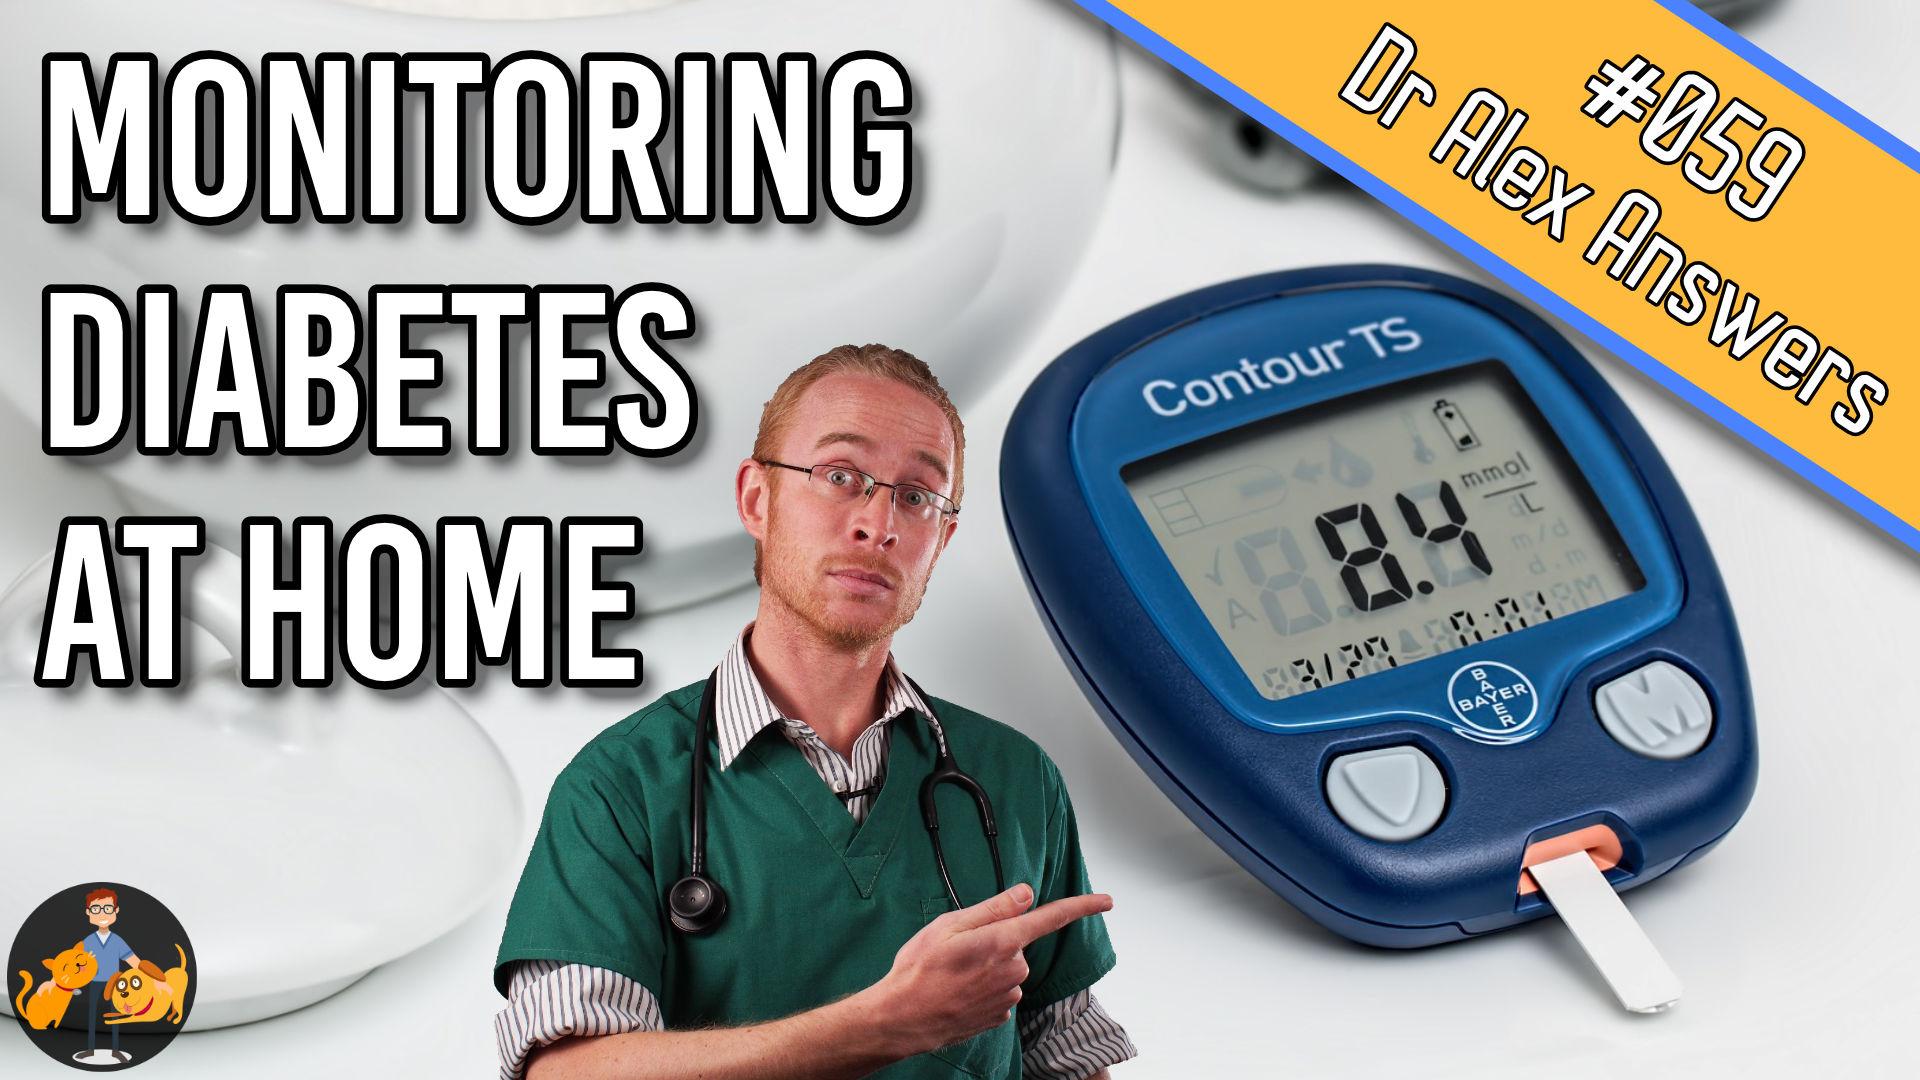 DAA diabetes monitoring 059.jpg